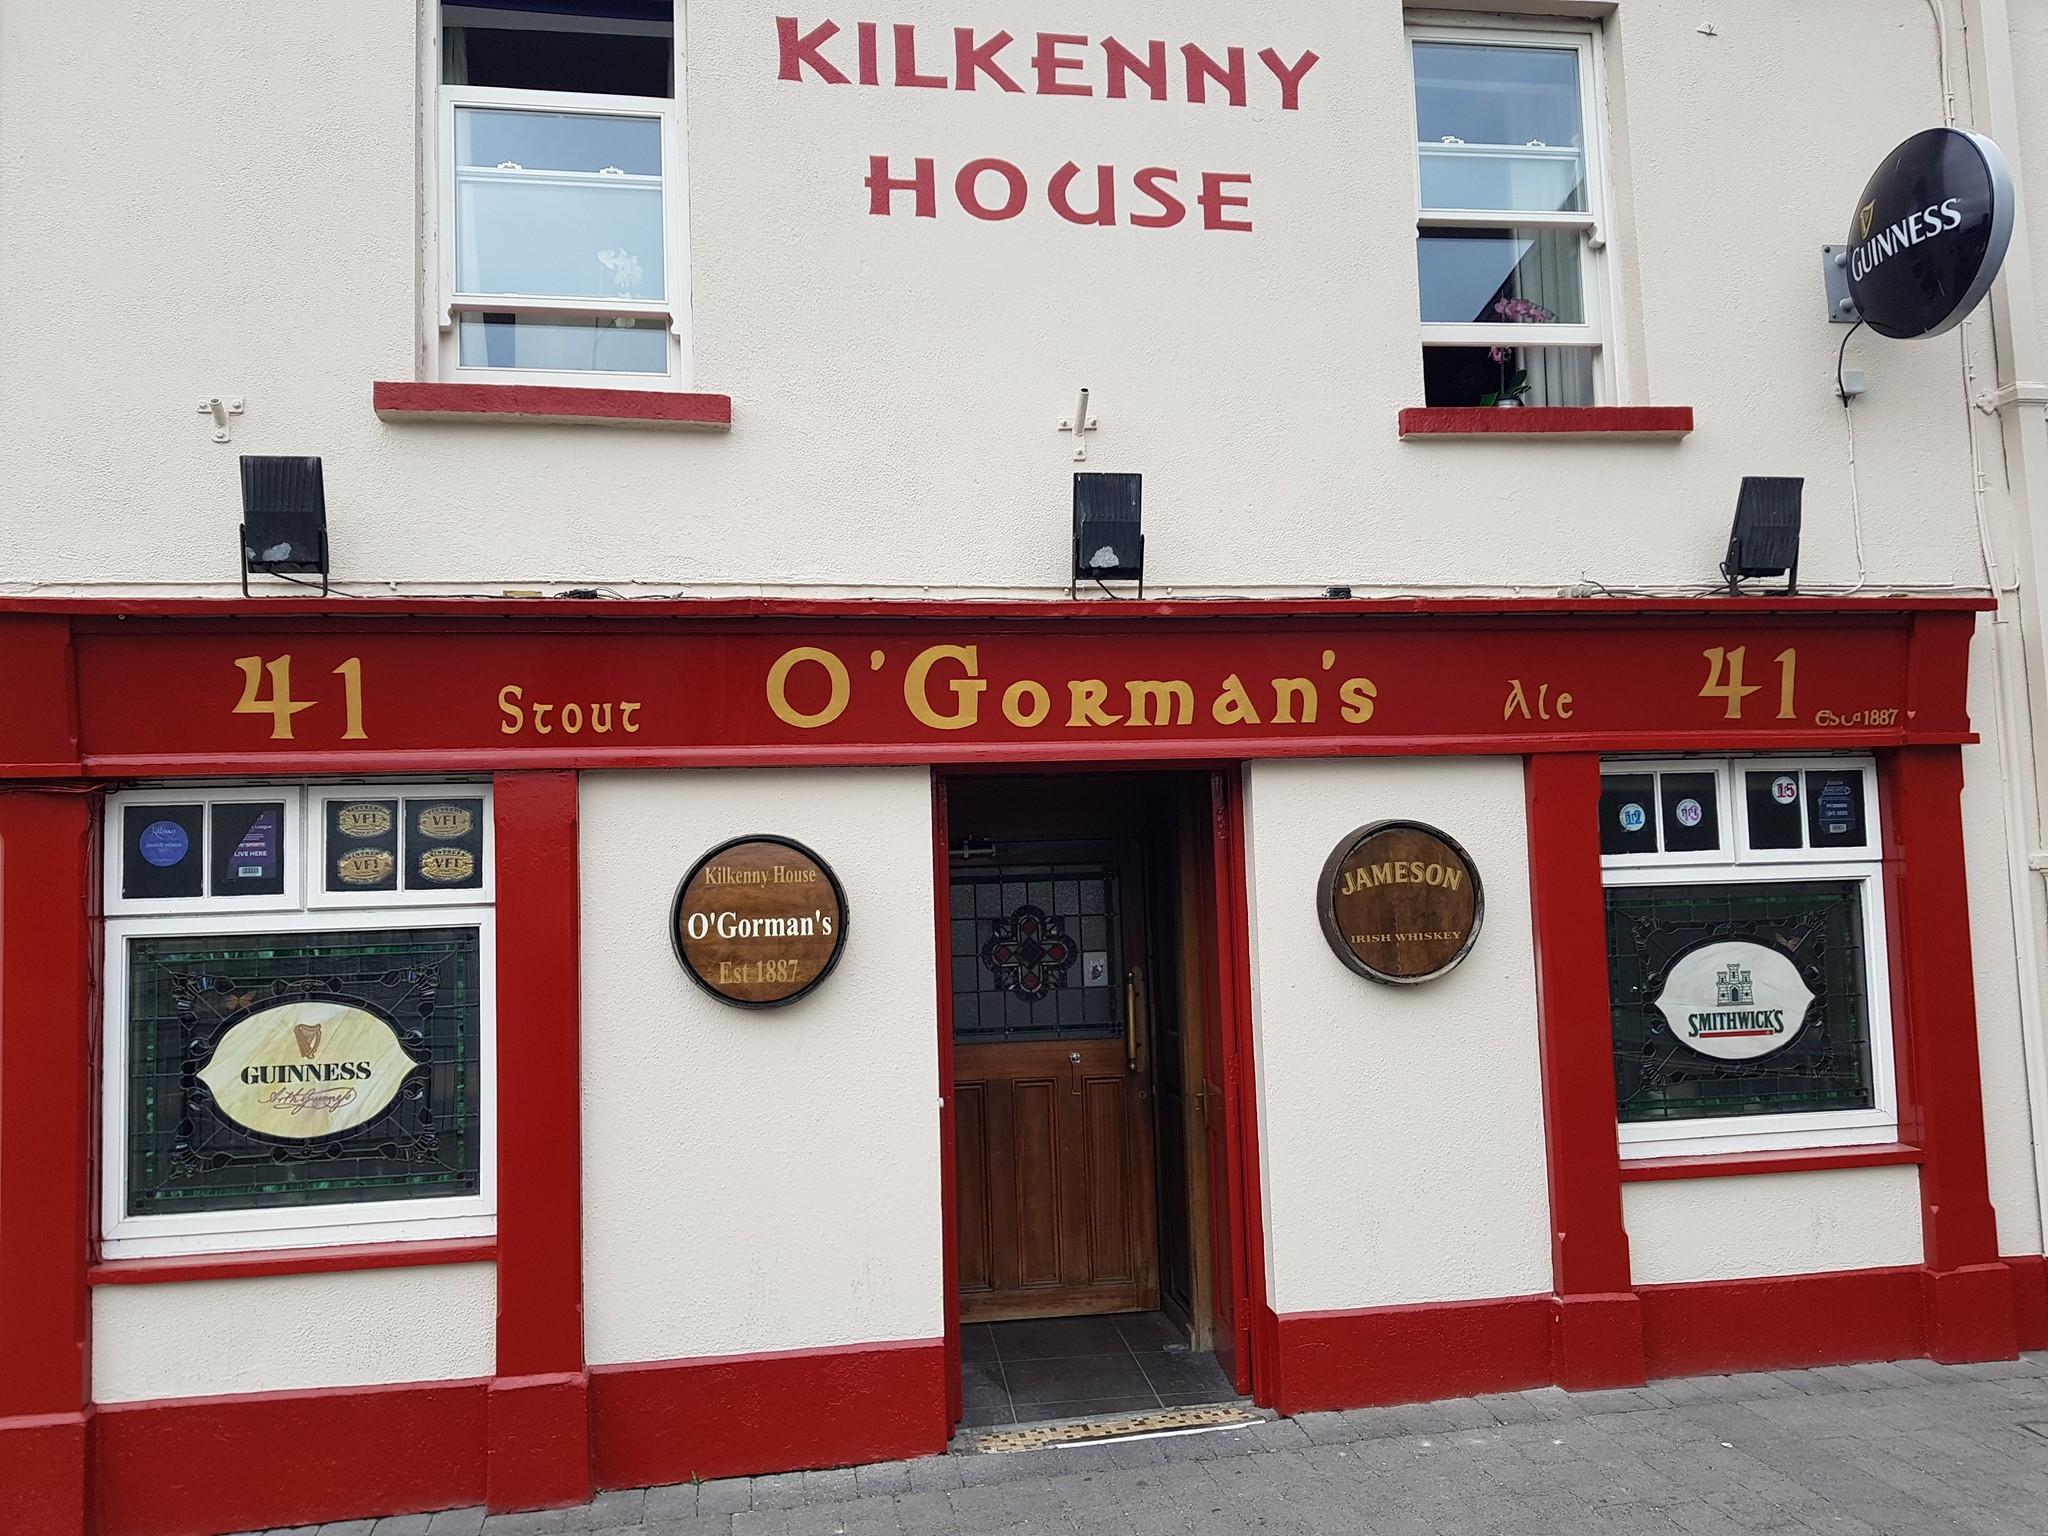 Kilkenny House O'Gorman's